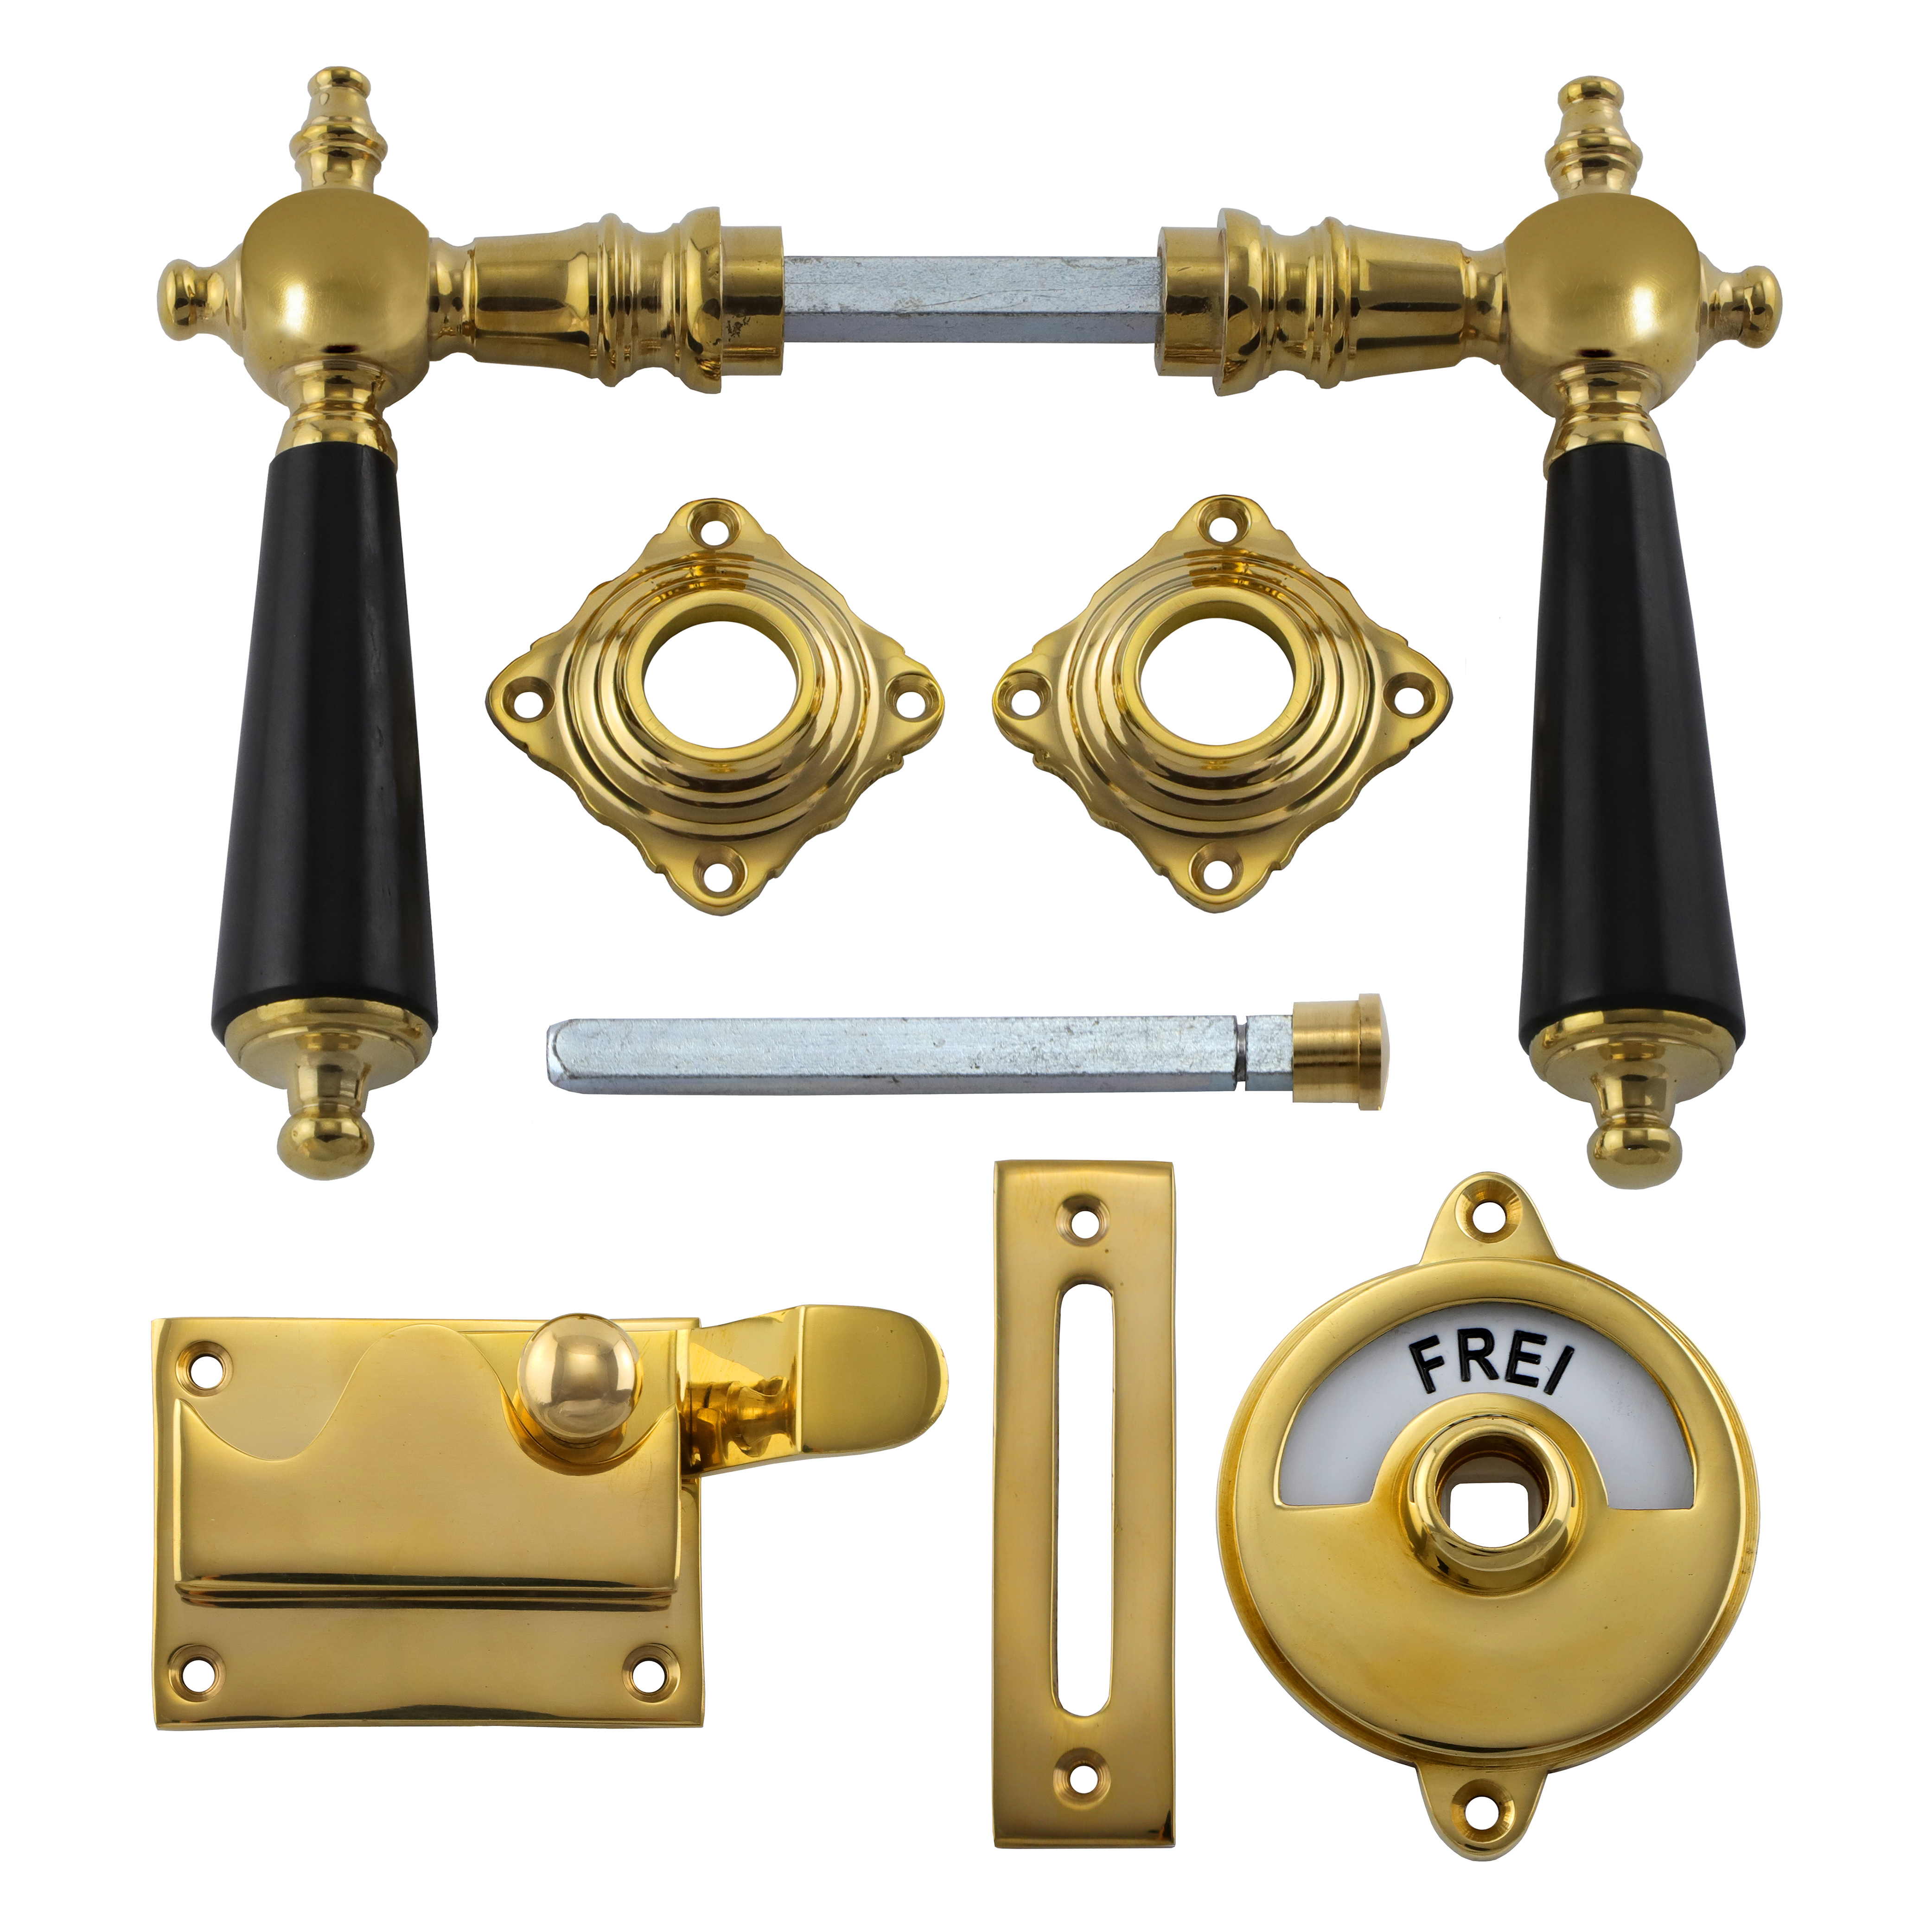 341.0015.35 WC-Türbeschlag / Riegel gekröpft / Verschluss mit Anzeige Messing poliert